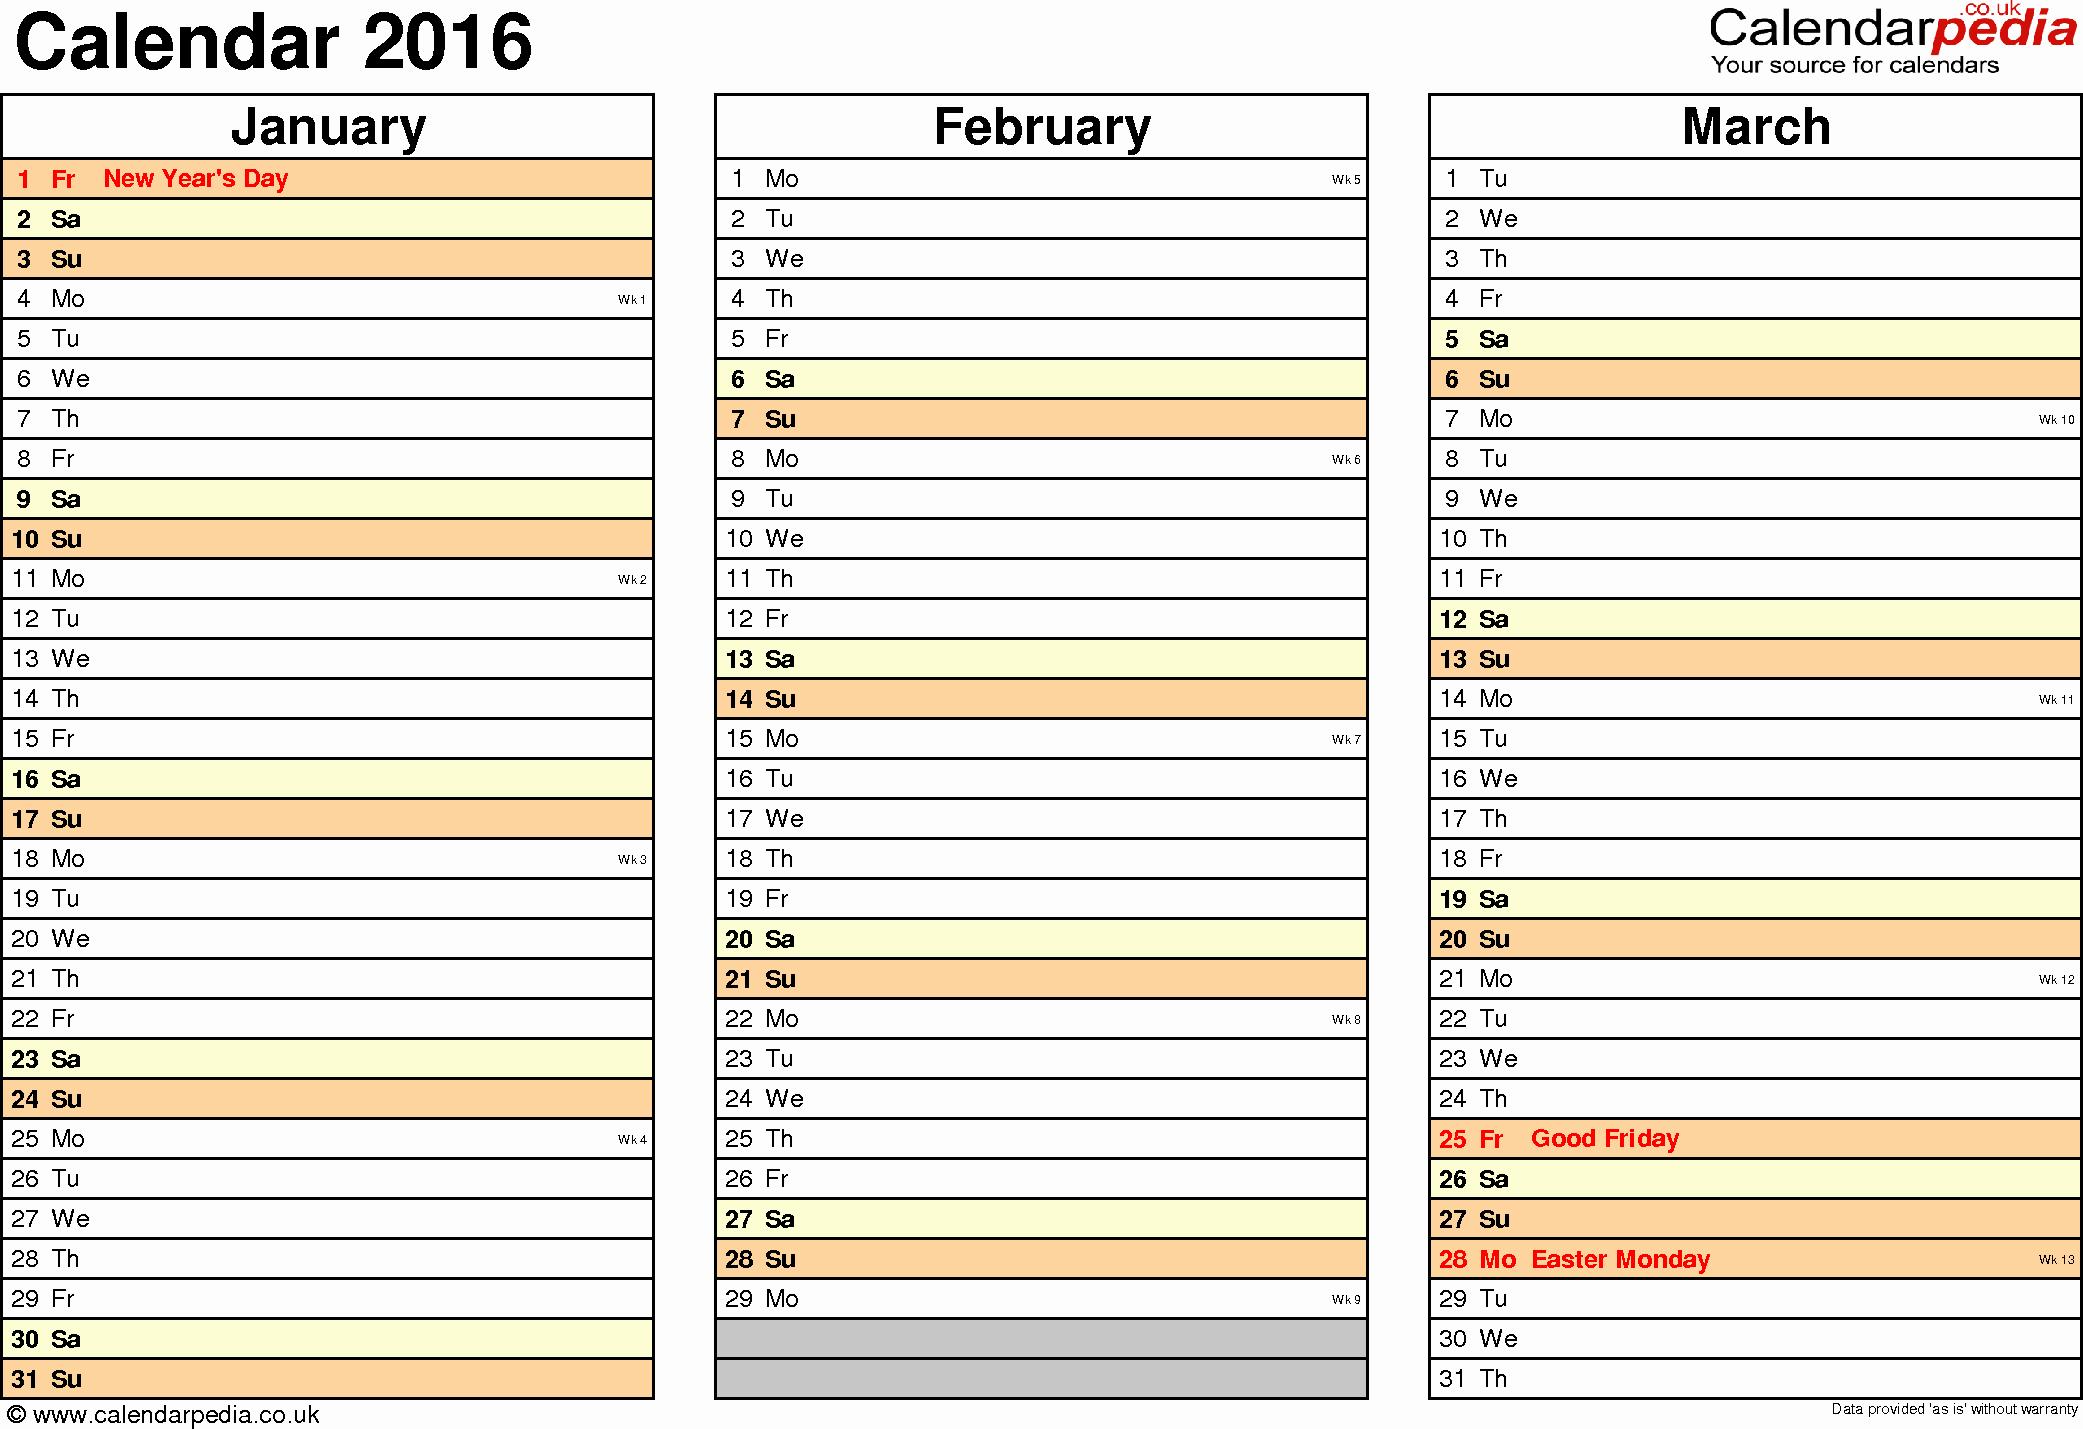 Calendar 2016-17 Template New Calendar 2016 Uk 16 Free Printable Pdf Templates